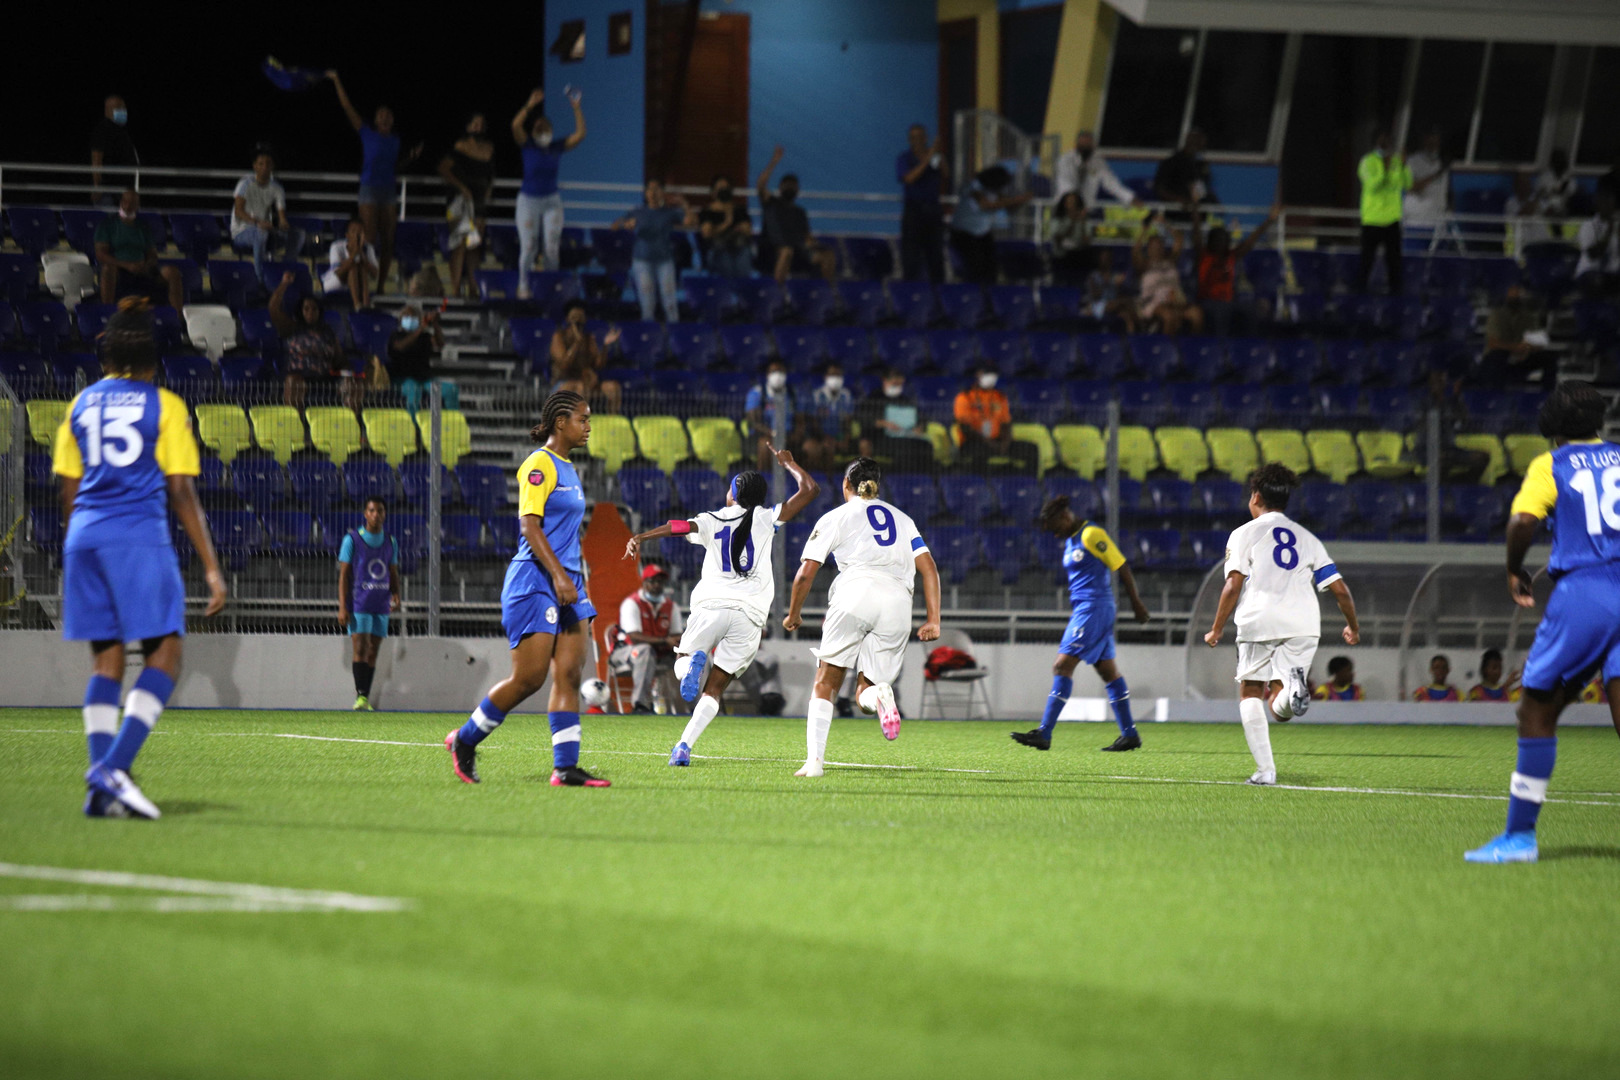 Curacao, Bermuda, Suriname among Day 1 winners at CWU20Q